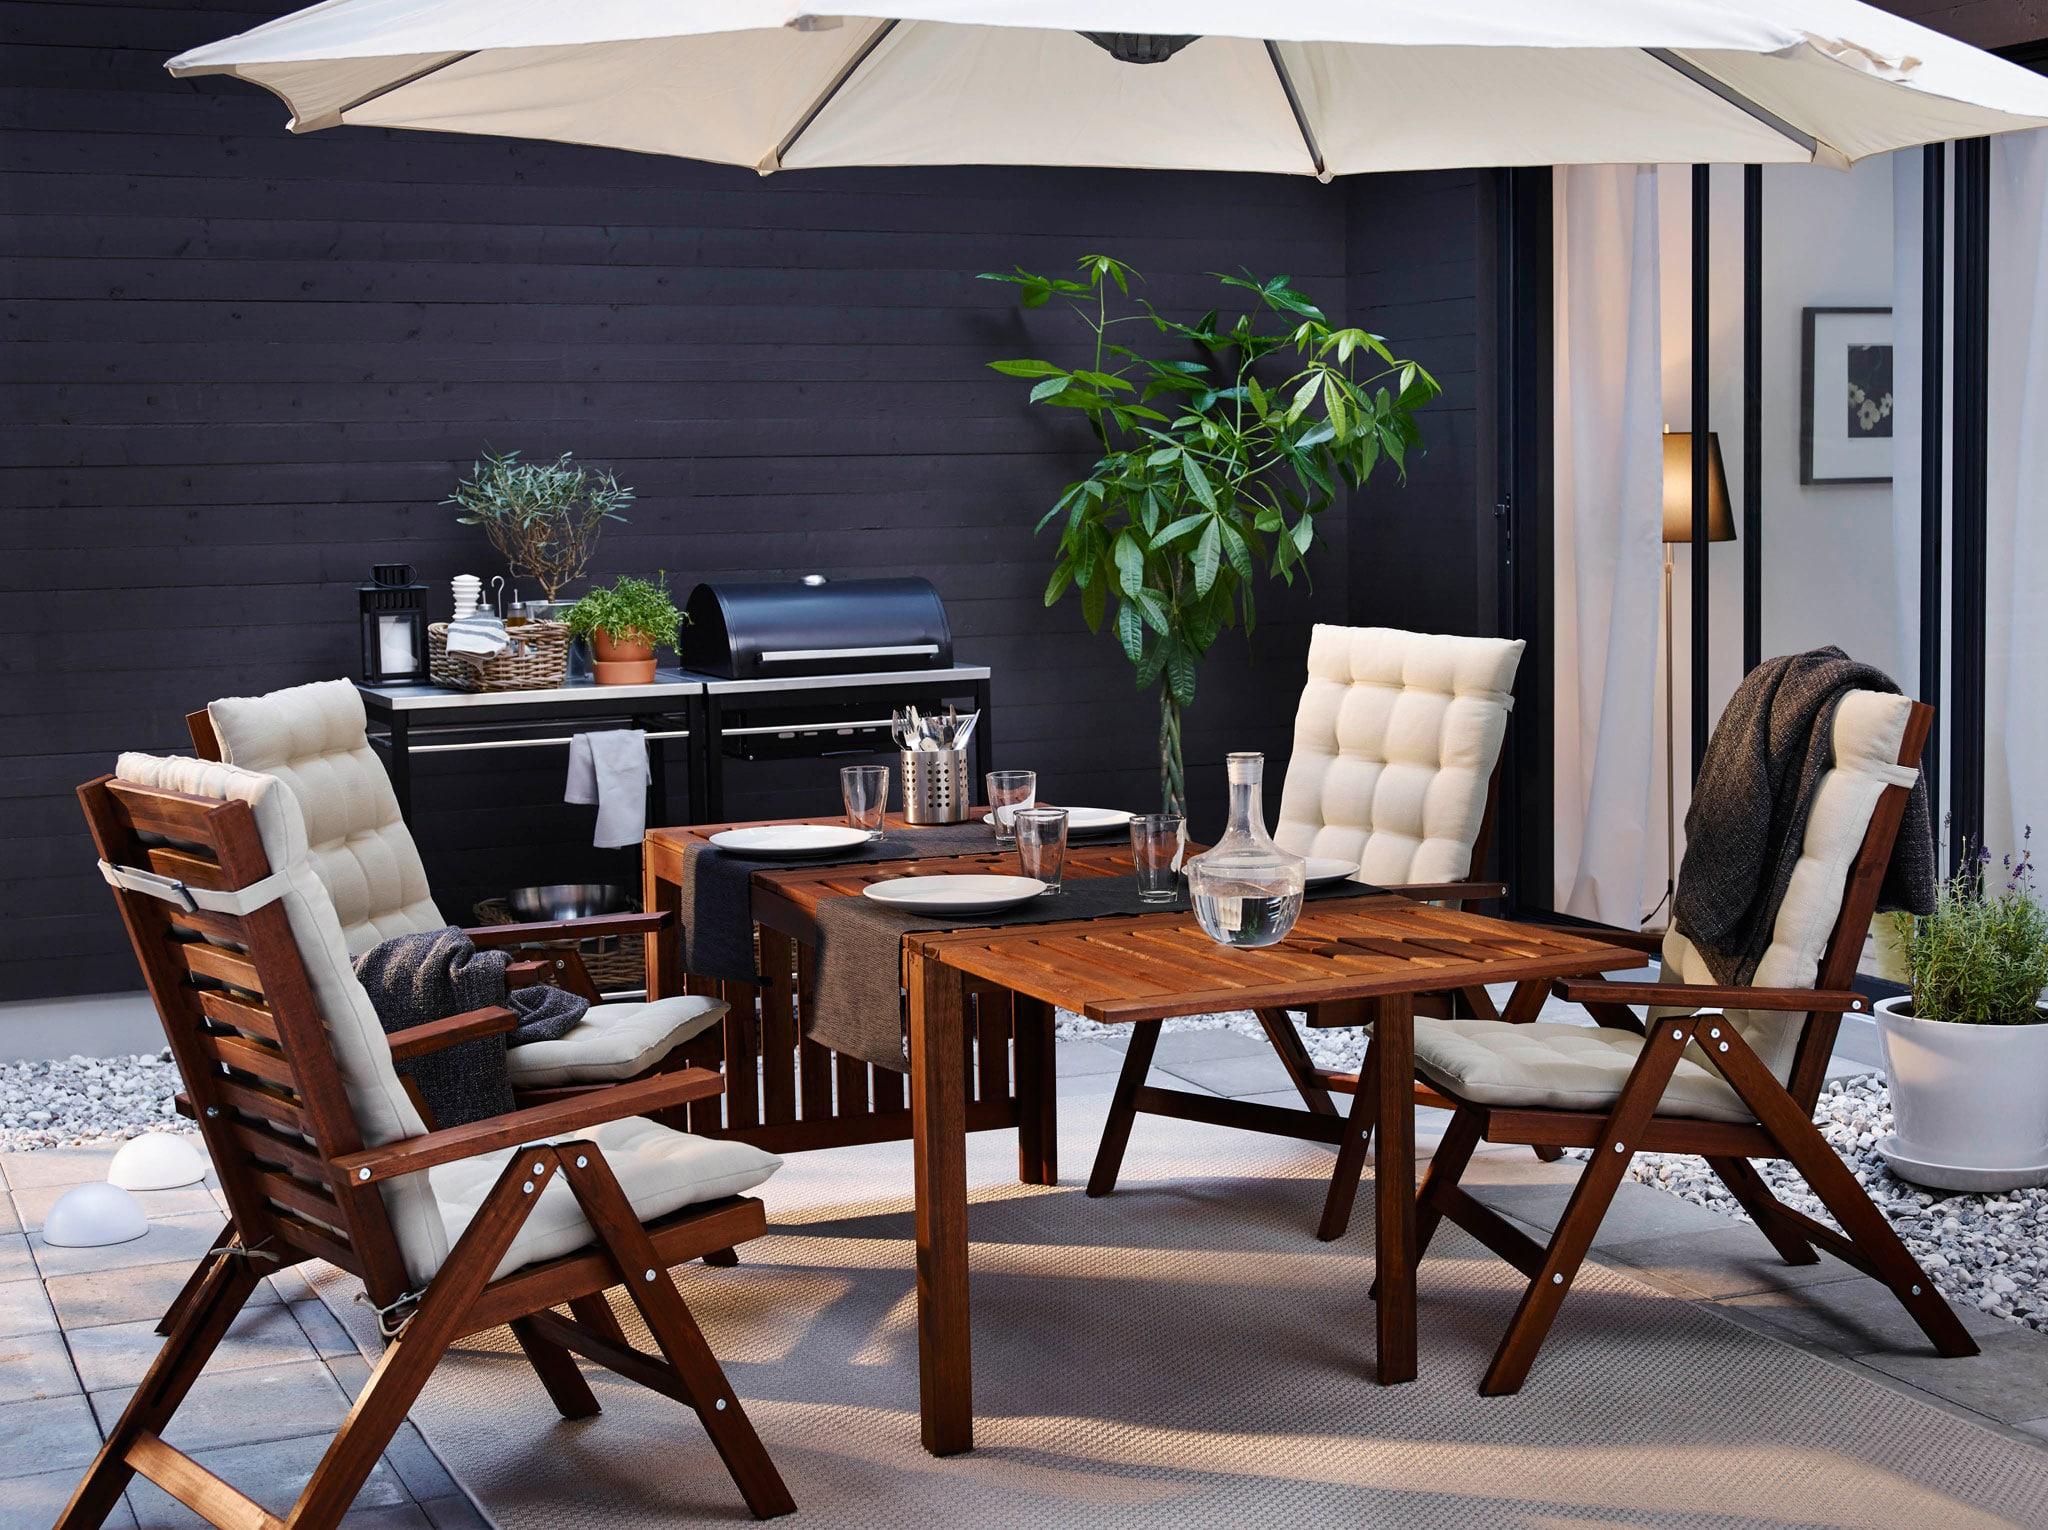 Ikea Sillas Jardin Gdd0 Muebles De Jardà N Y Terraza Muebles De Exterior Pra Online Ikea